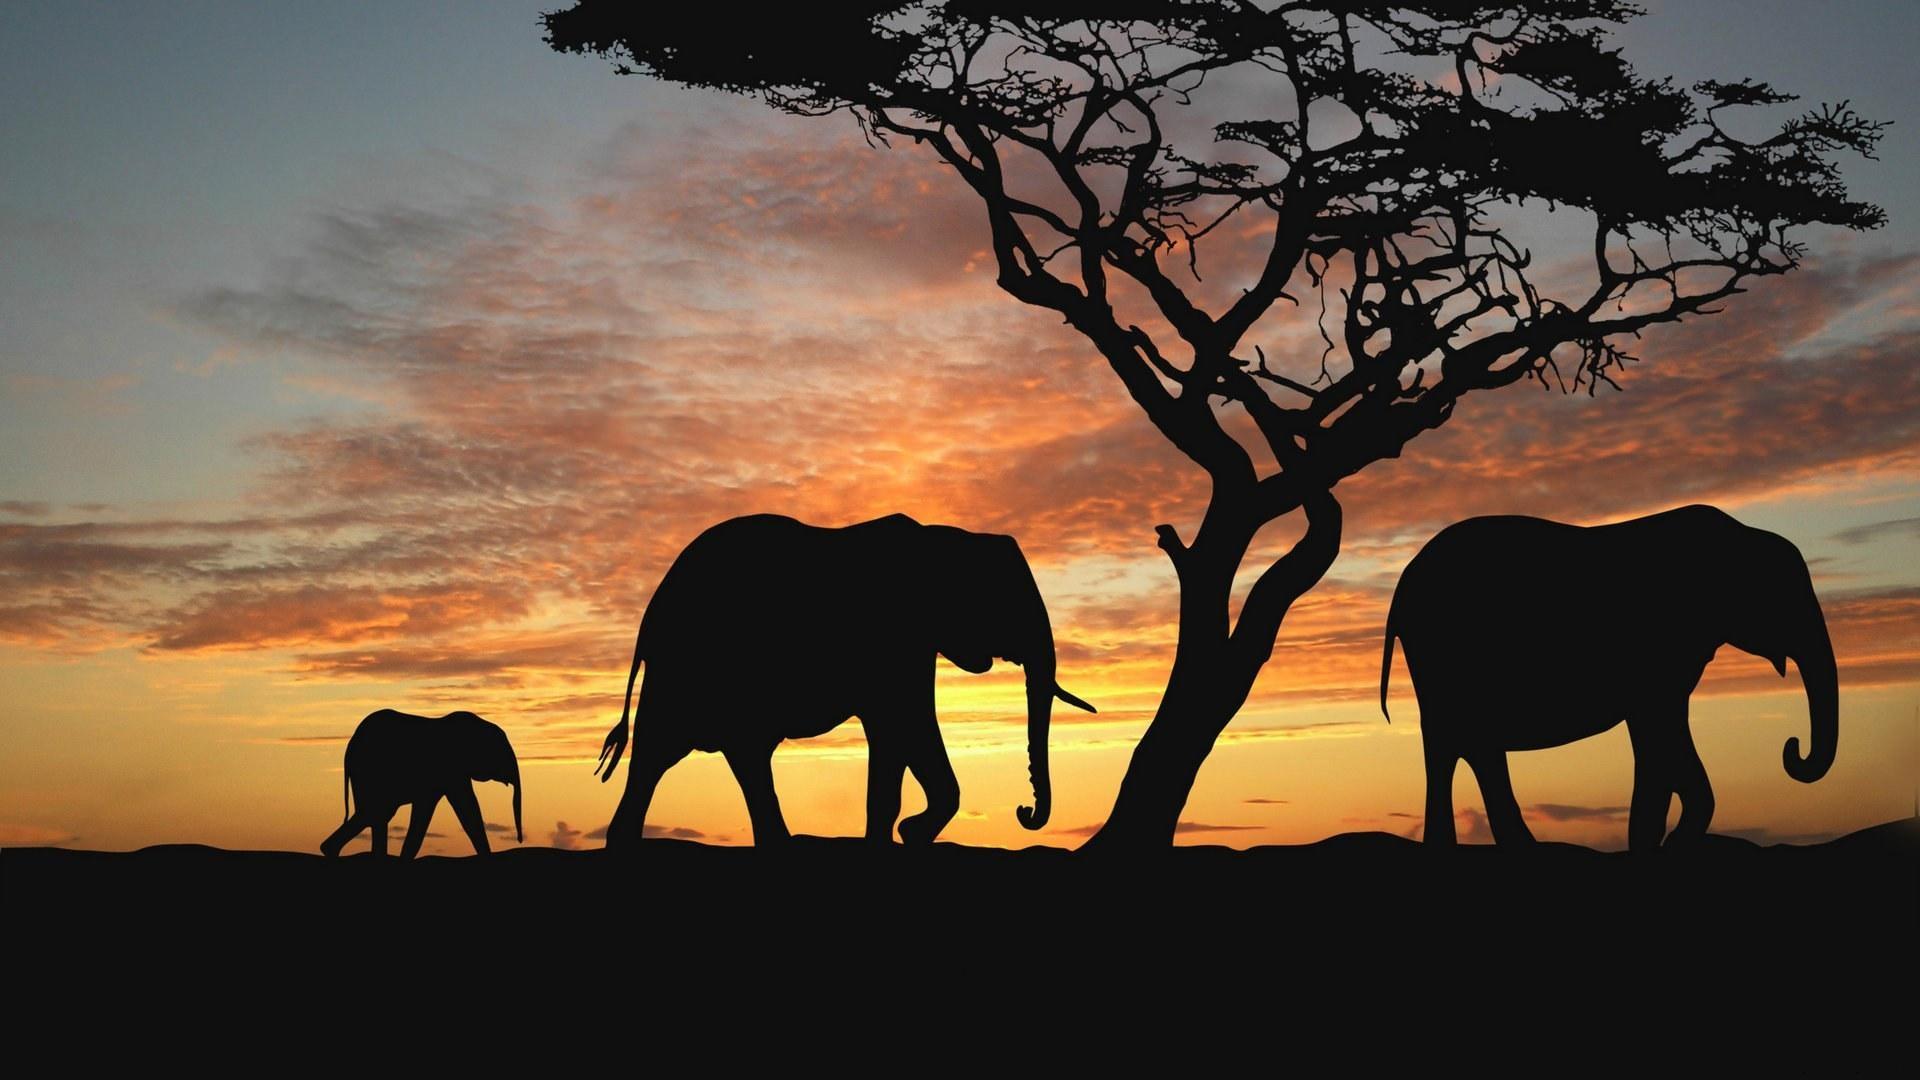 16 Luxury Pubg Wallpaper Iphone 6: 壁纸 夕阳下的大象 1920x1080 Full HD 2K 高清壁纸, 图片, 照片